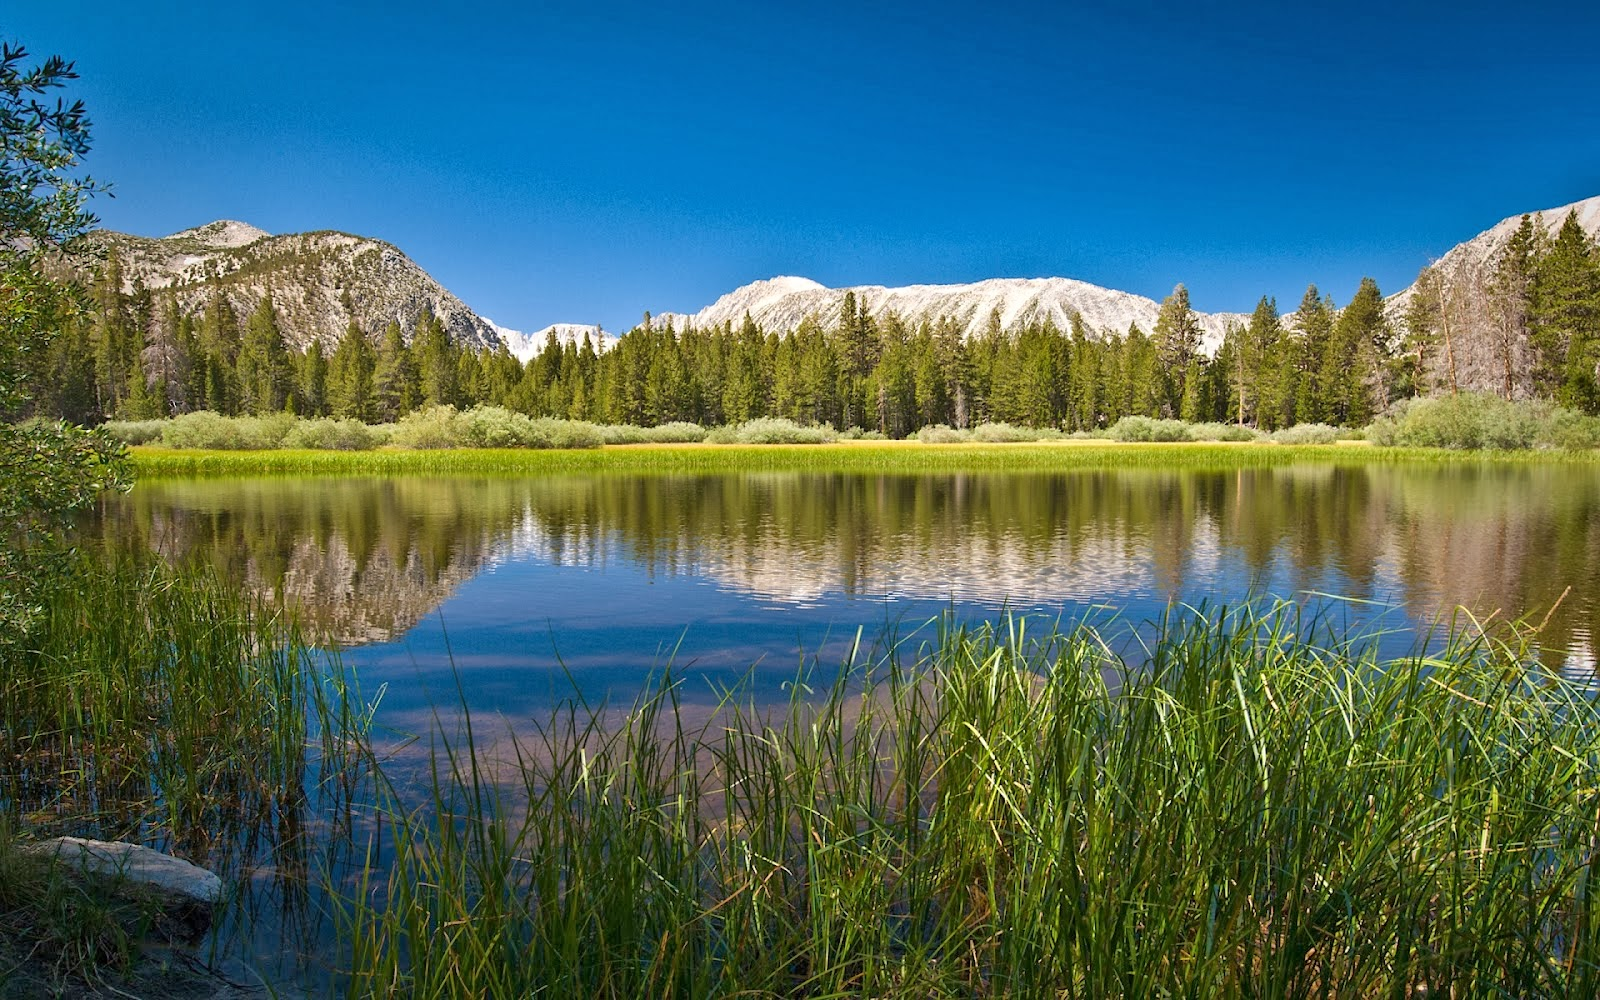 landscape mountain beautiful wallpaper - photo #11